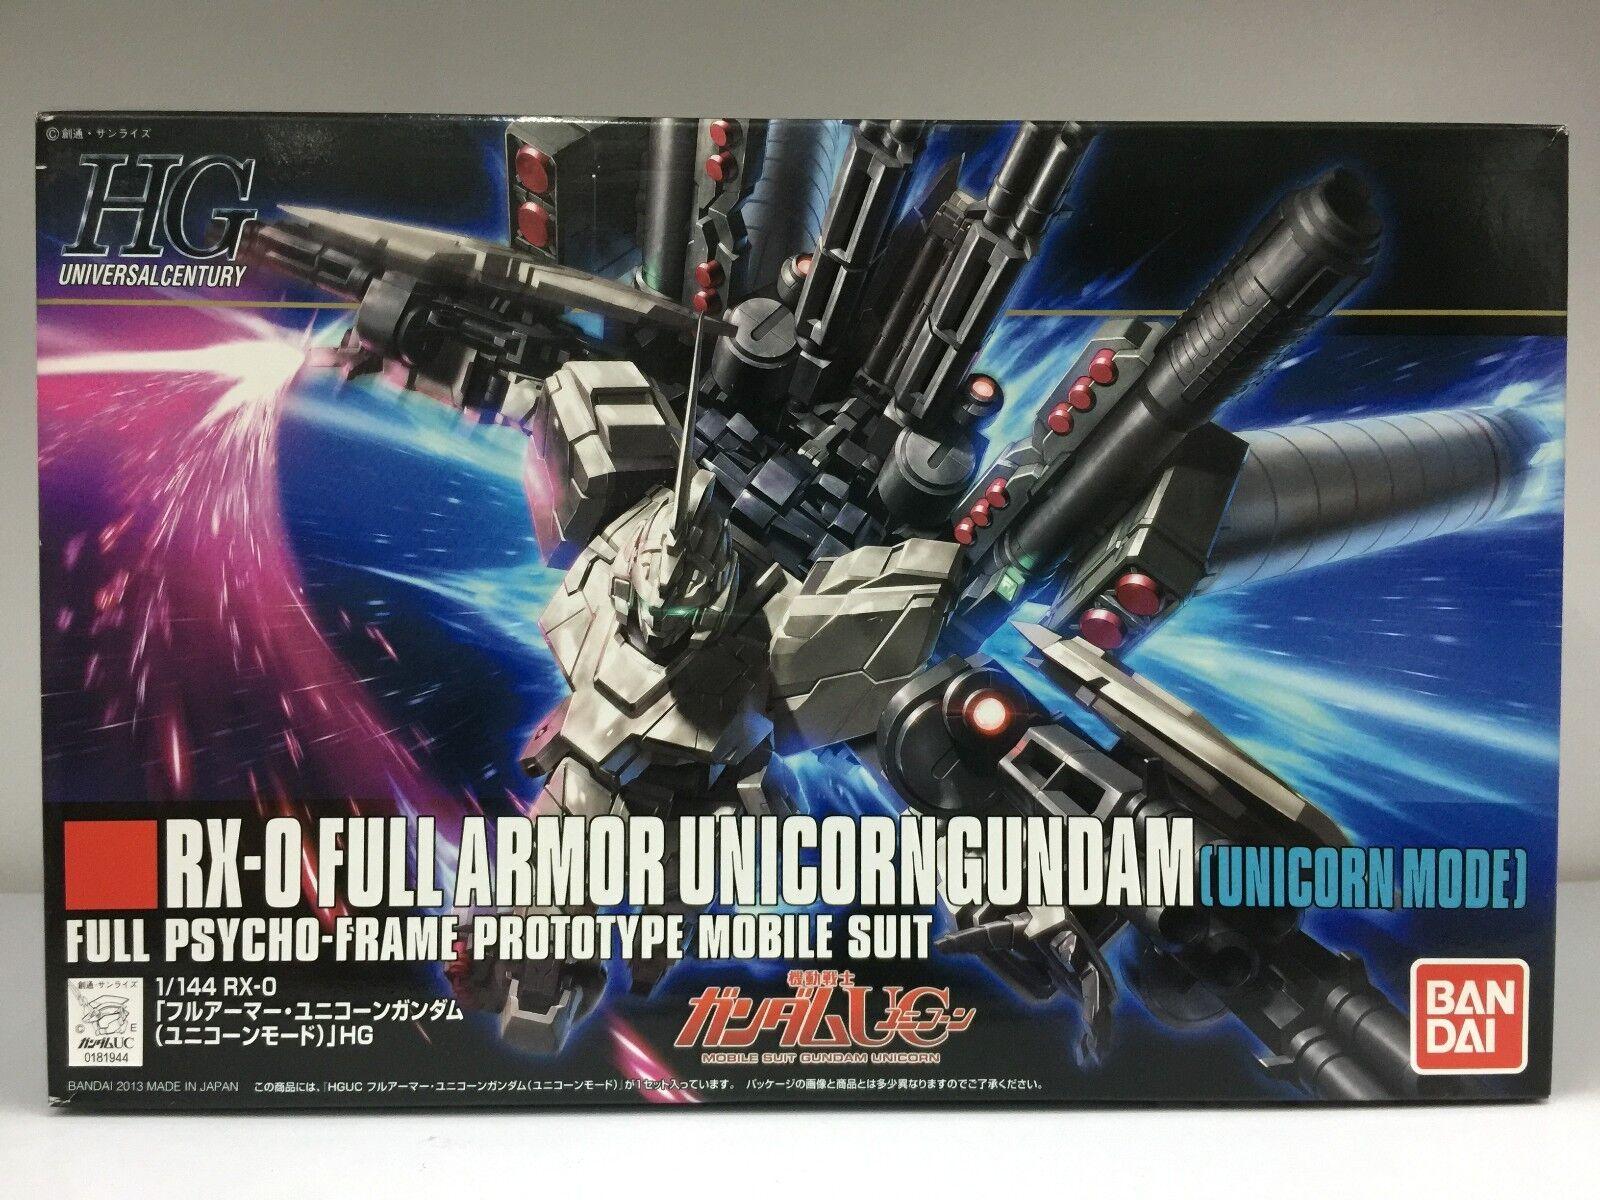 Bandai 0181944 HGUC 156 HG 1 144 RX-0 Full Full Full Armor Unicorn Gundam Unicorn Mode JPN ed2463